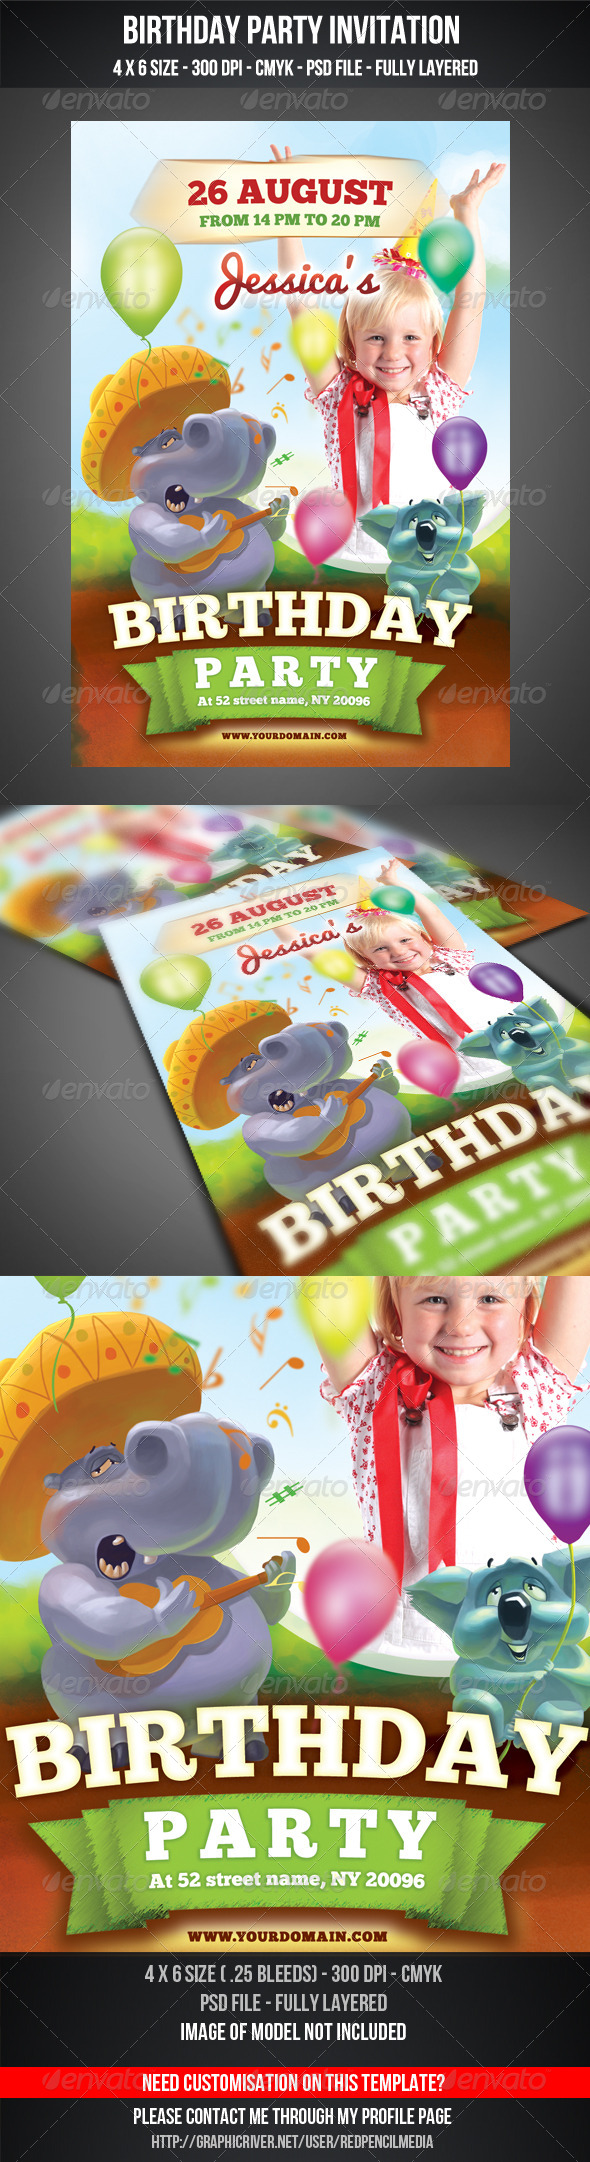 Birthday Party Invitation Flyer - Flyers Print Templates